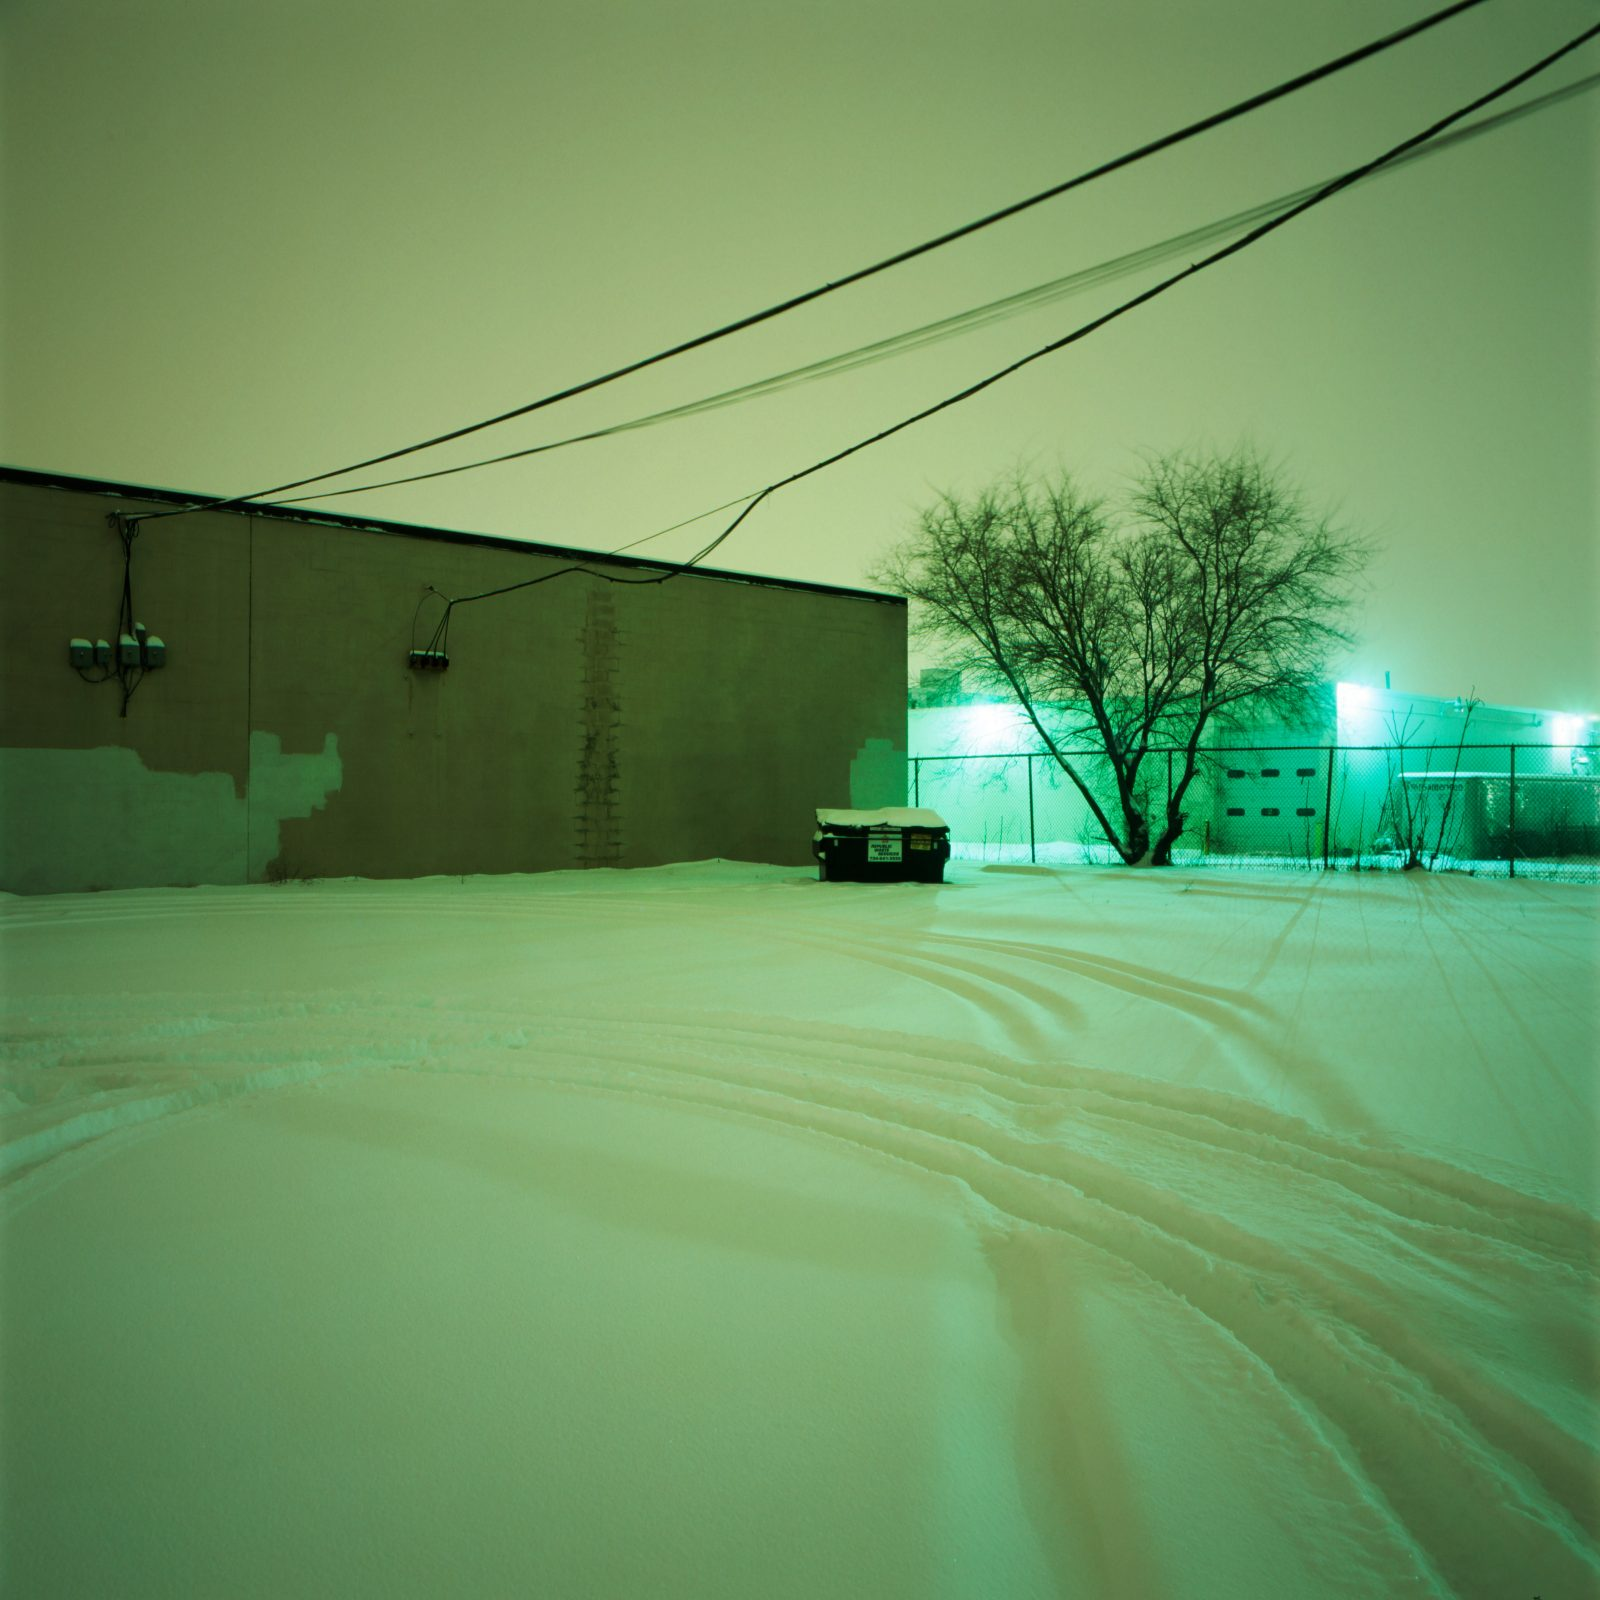 Detroit, Michigan - February 5, 2004